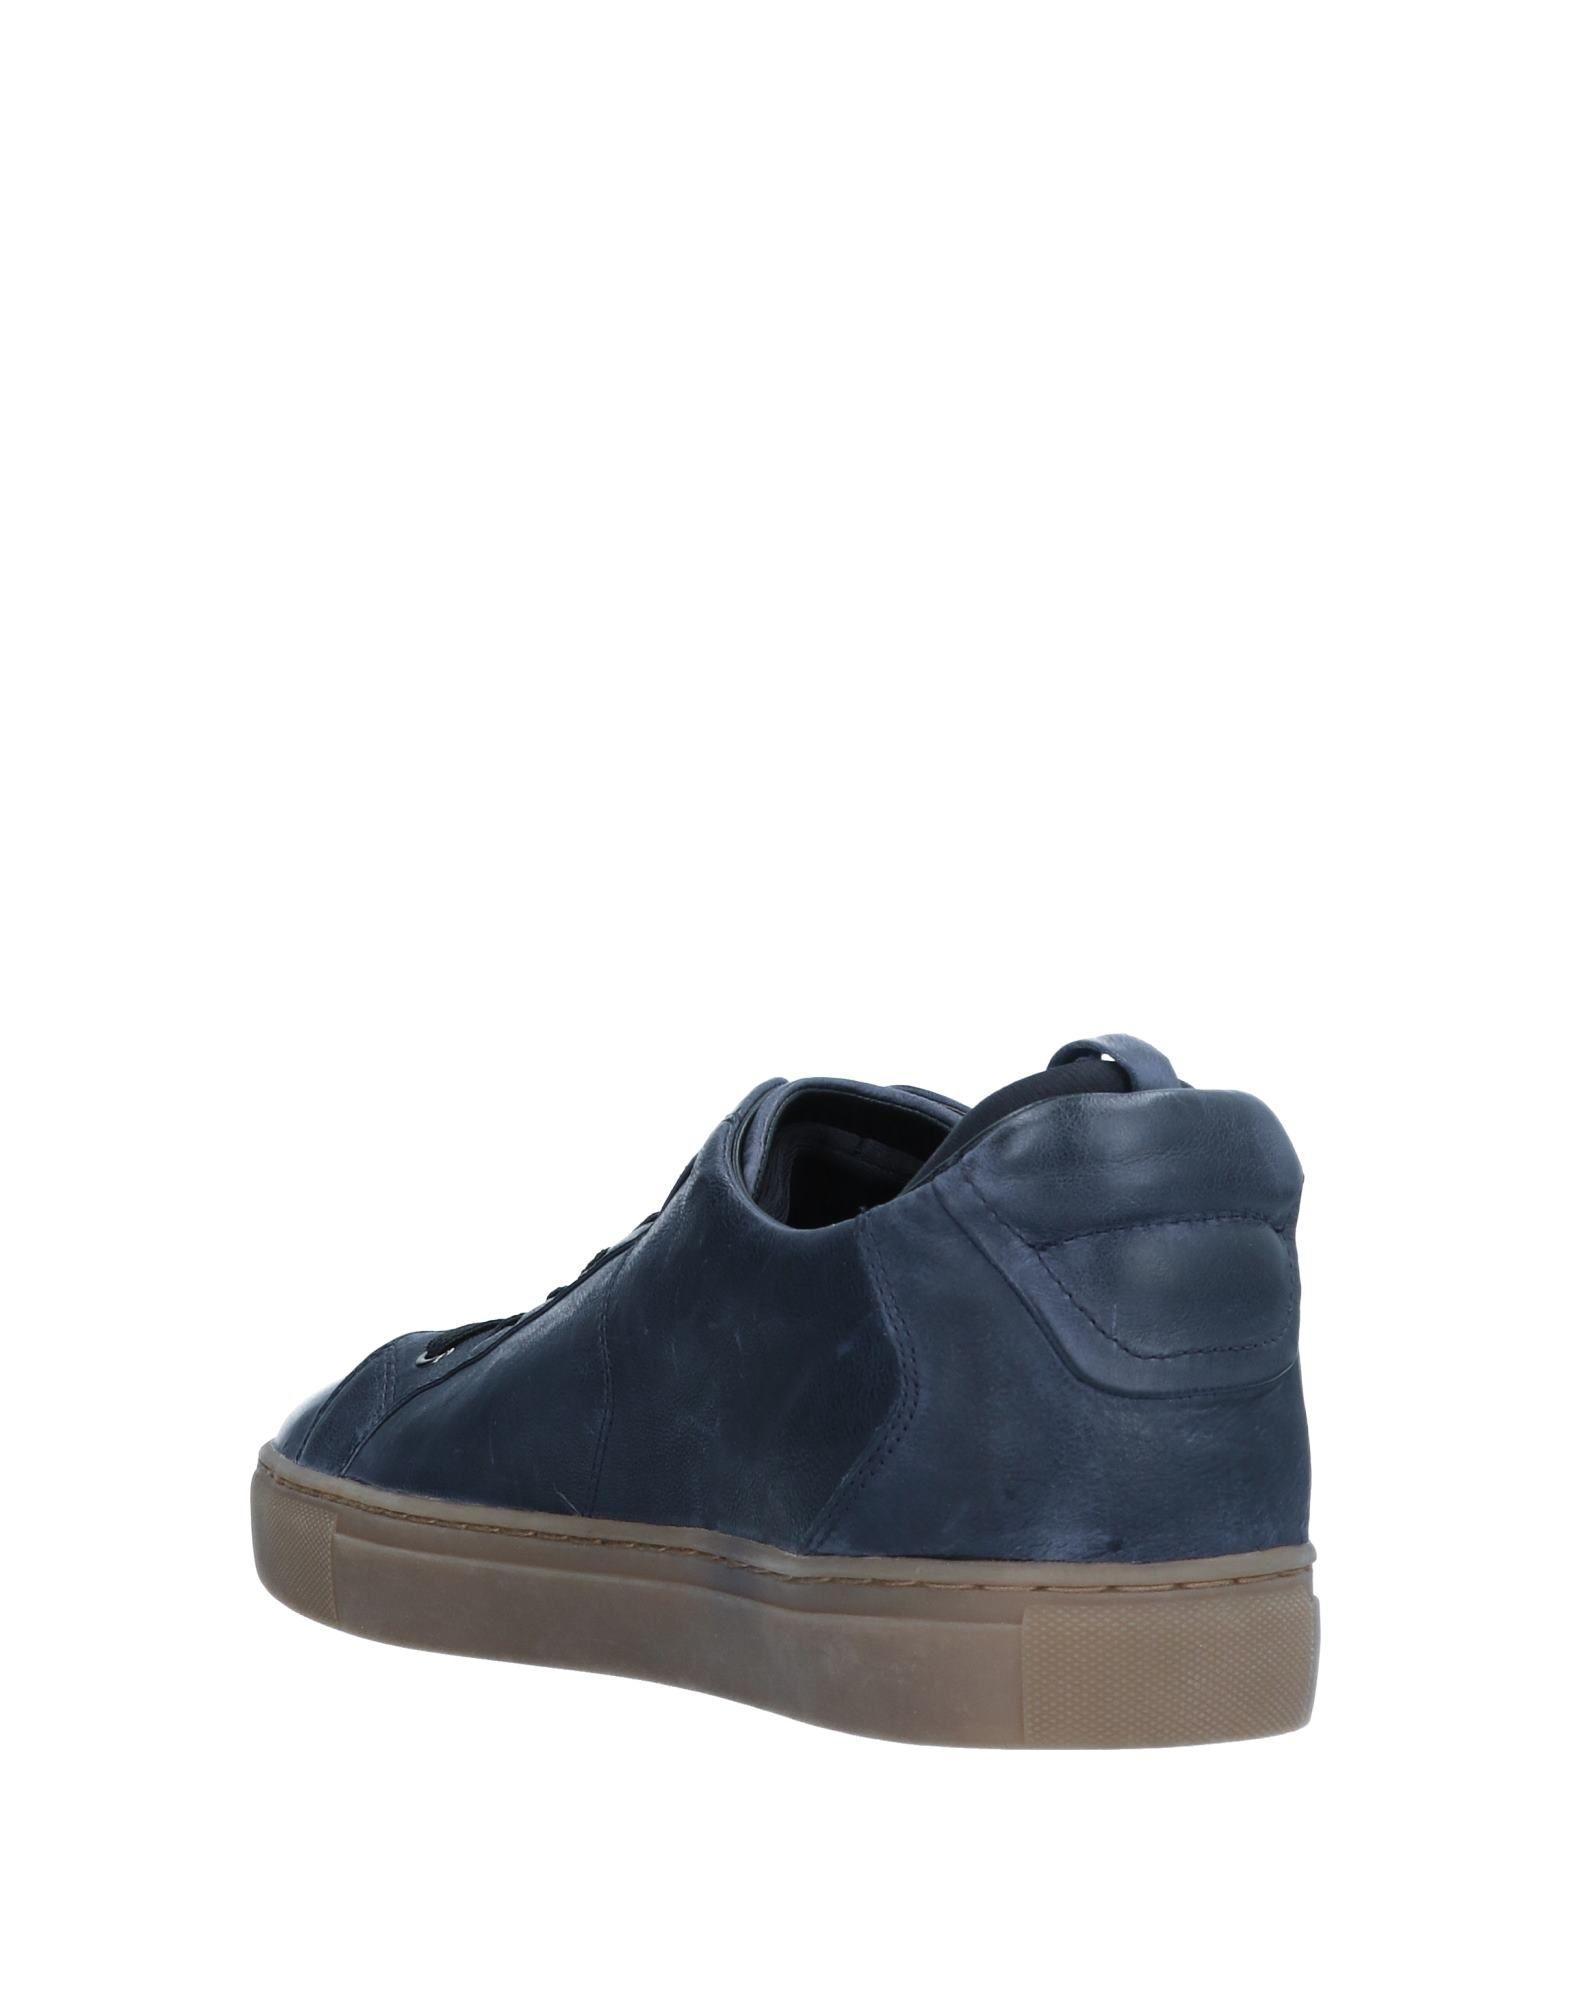 Rabatt echte Schuhe  Crime London Sneakers Herren  Schuhe 11556187OX be9ac3